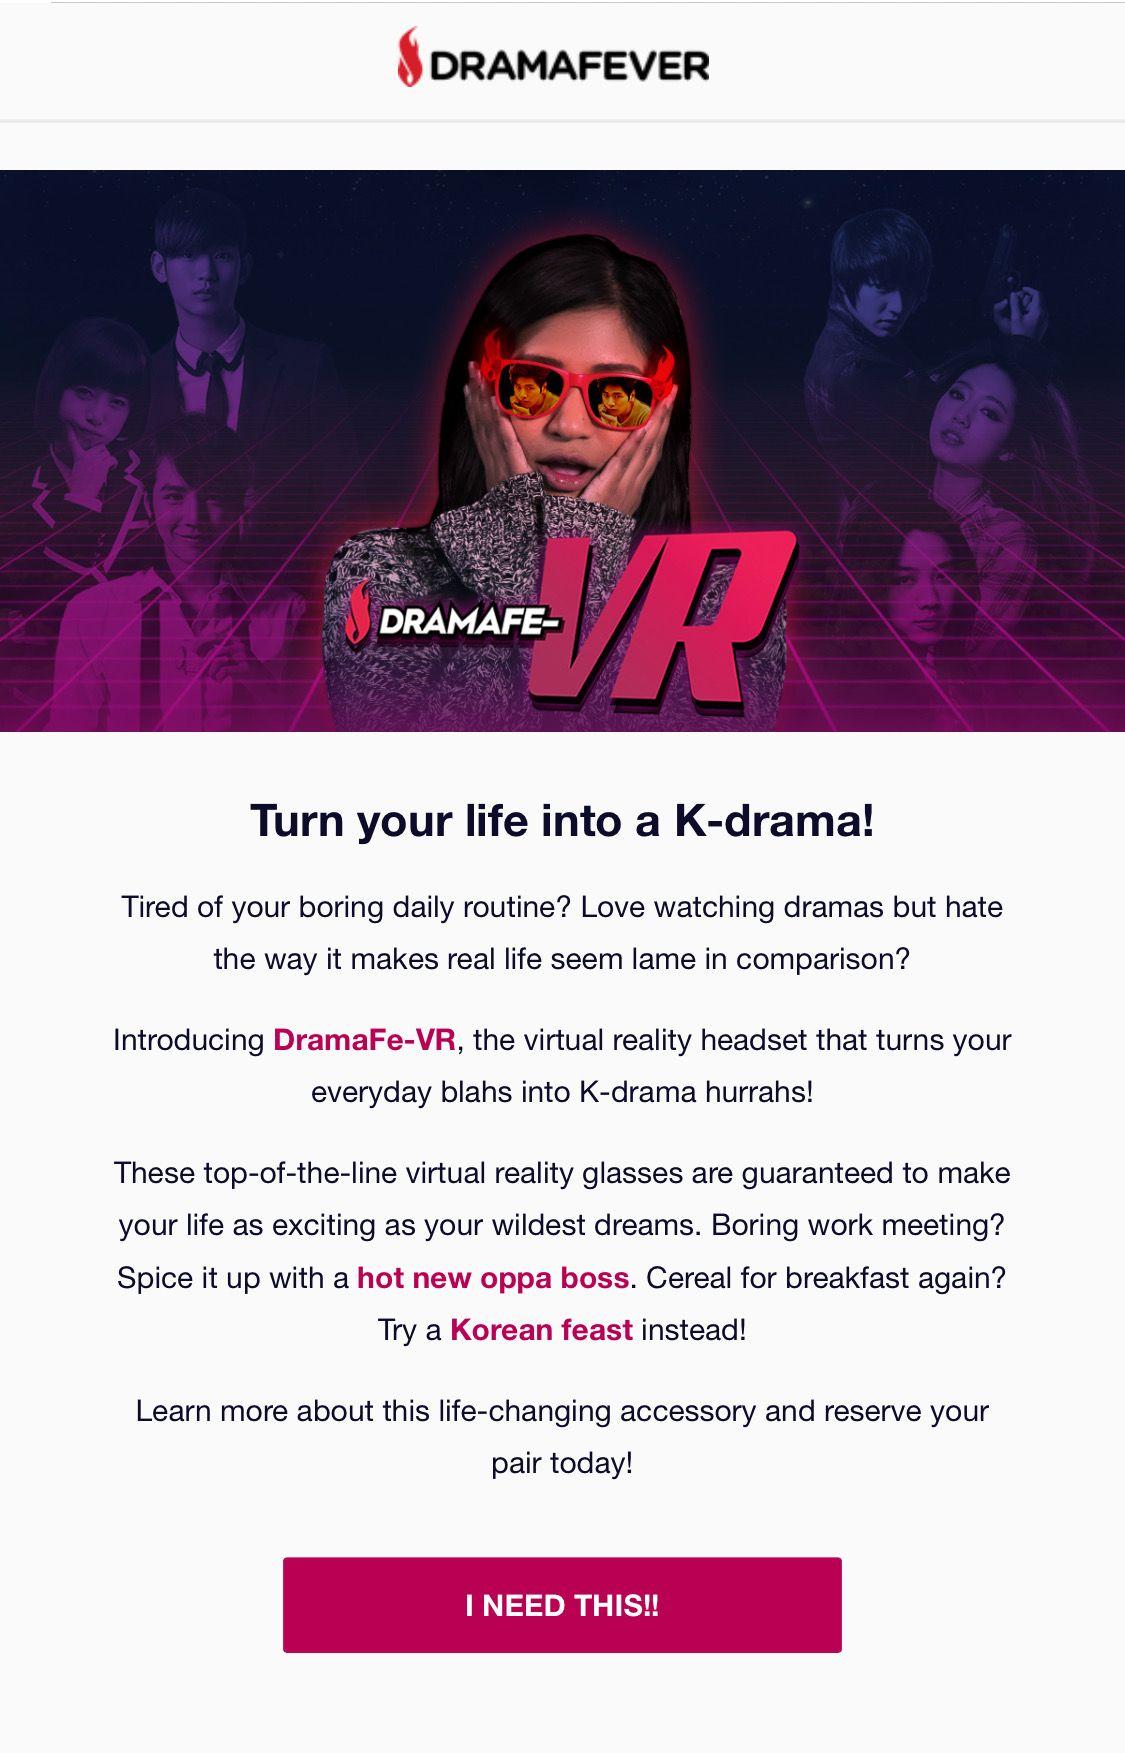 Pin By Cynthia Christensen On Korean Drama Virtual Reality Glasses Virtual Reality Headset Real Life